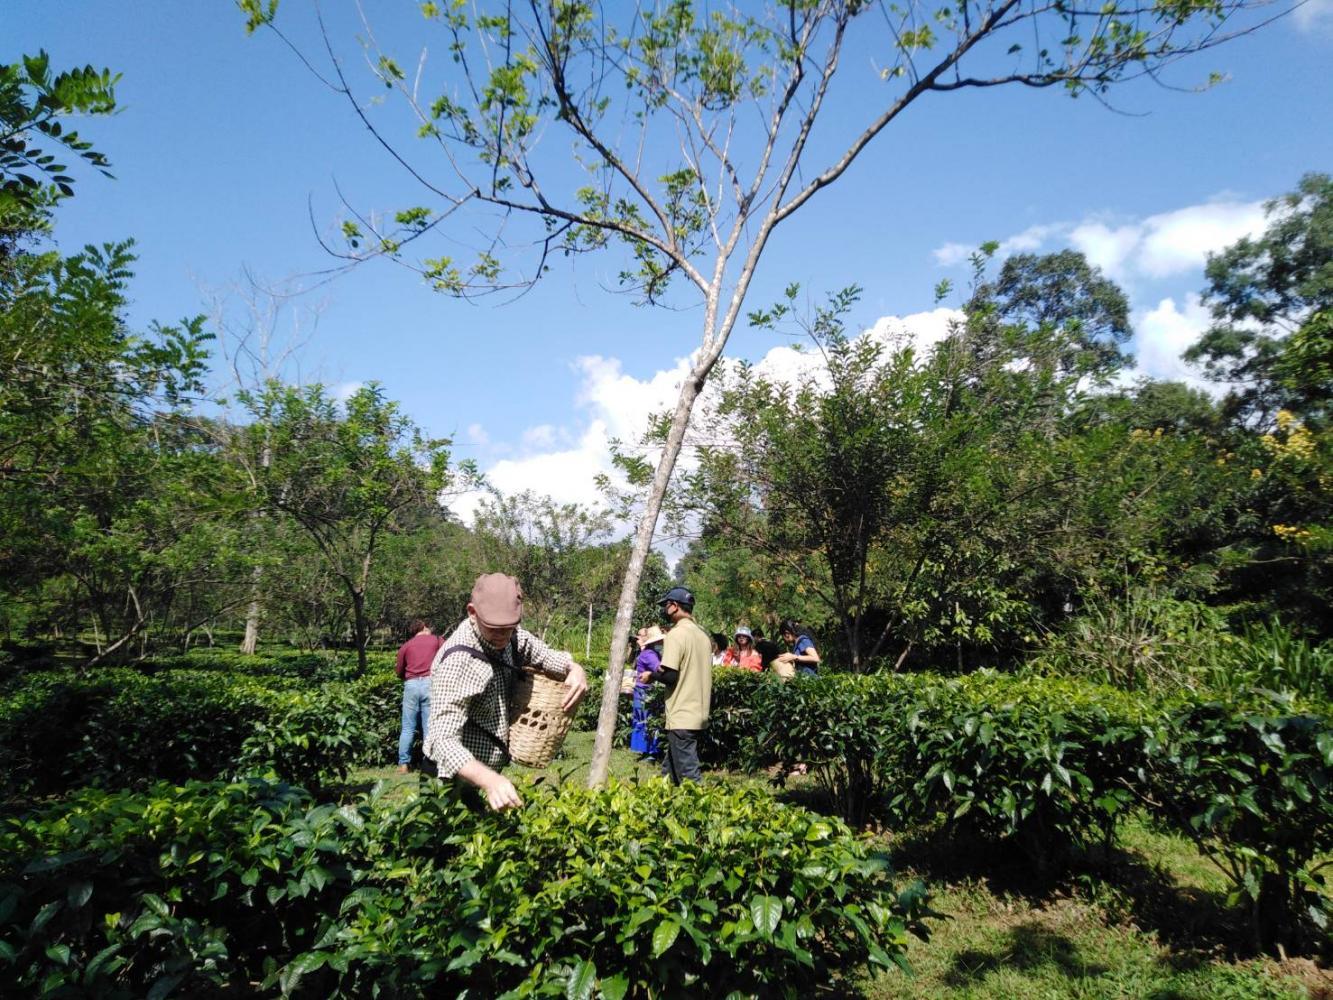 Tourists enjoy a tea picking at Araksa Tea Garden organic tea plantation in Chiang Mai.(Photo by Dusida Worrachaddejchai)